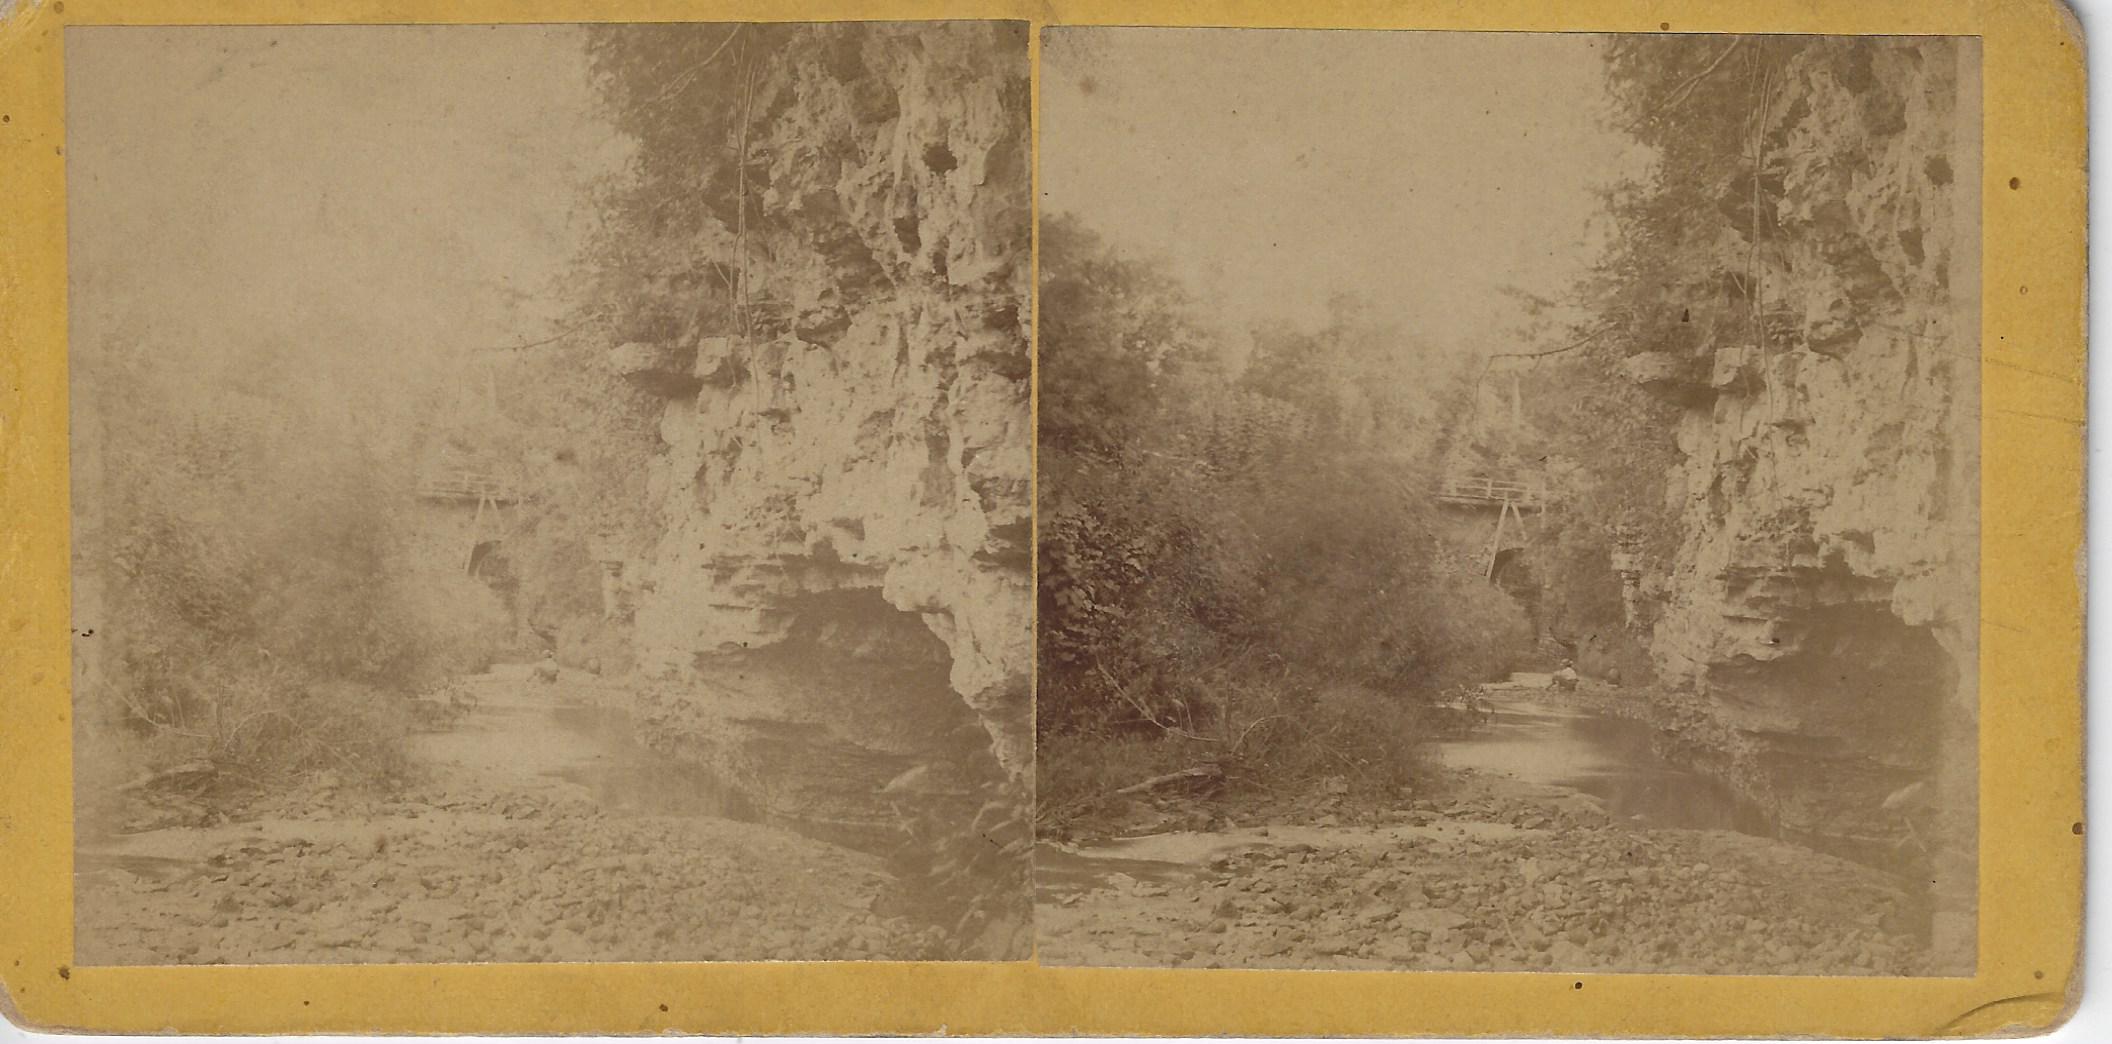 LJTP 100.281 - S. Root IFS - Old Rock River Bridge - c1875